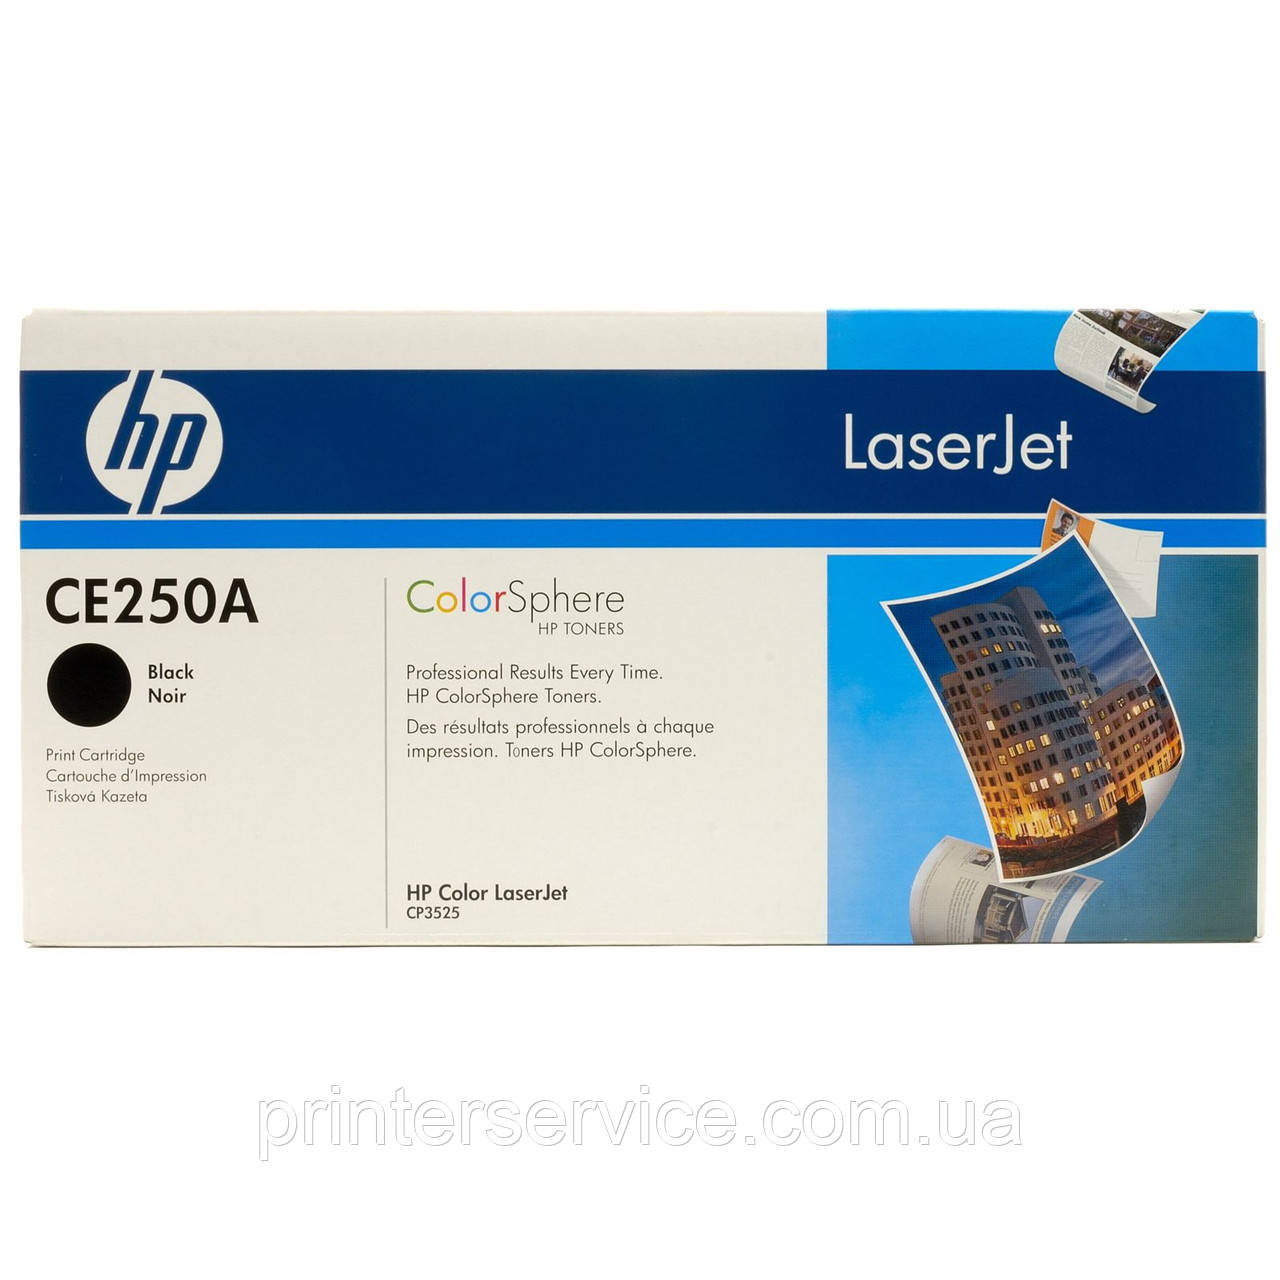 HP CE250A black картридж (№504A) для LJ CM3530 и CP3525 series